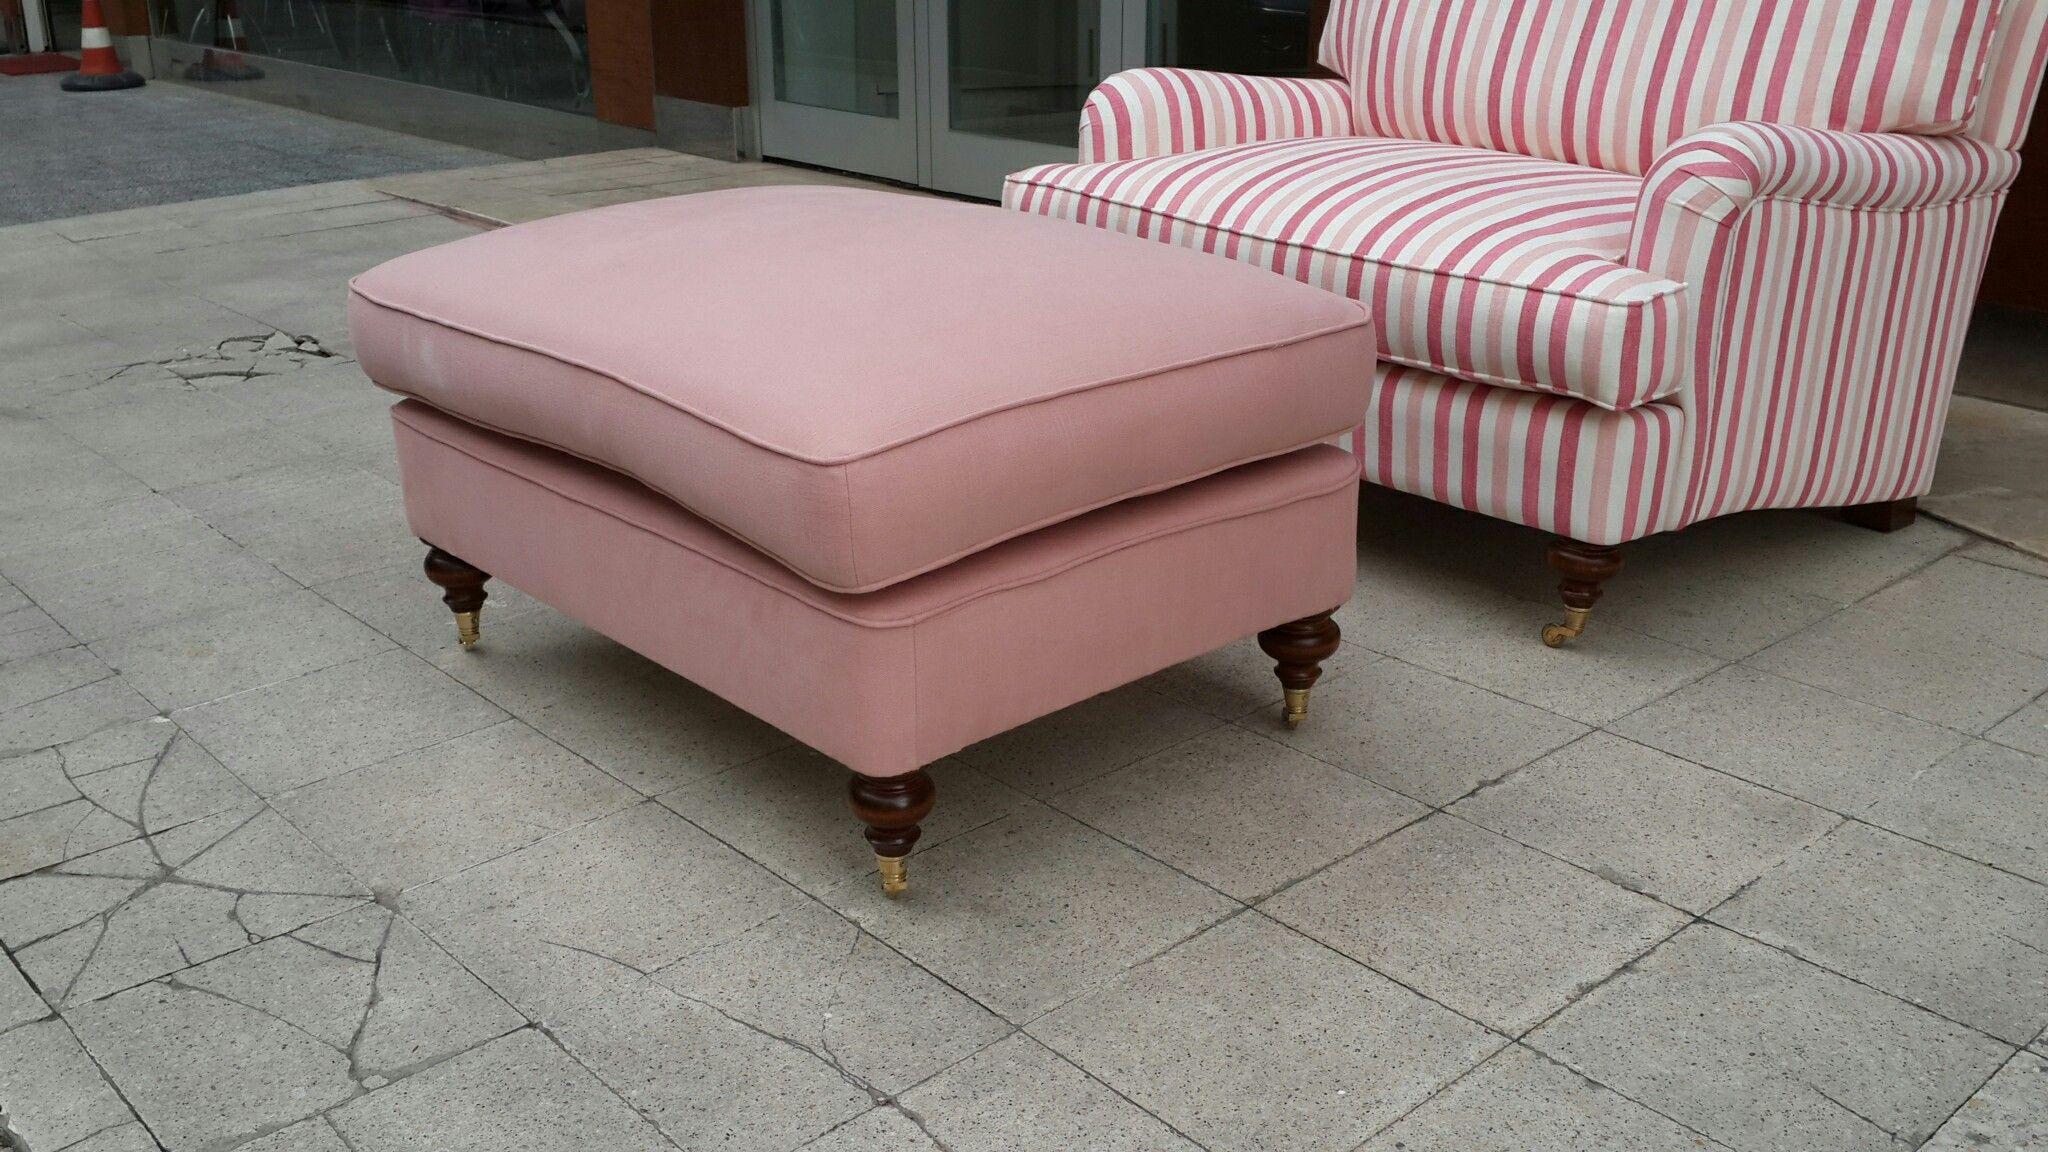 Ankara Klasik Kanepe Ankara Klasik Puf Classic Furniture Birbucuk Kisilik Tekli Koltuk Tekli Koltuk Koltuklar Klasik